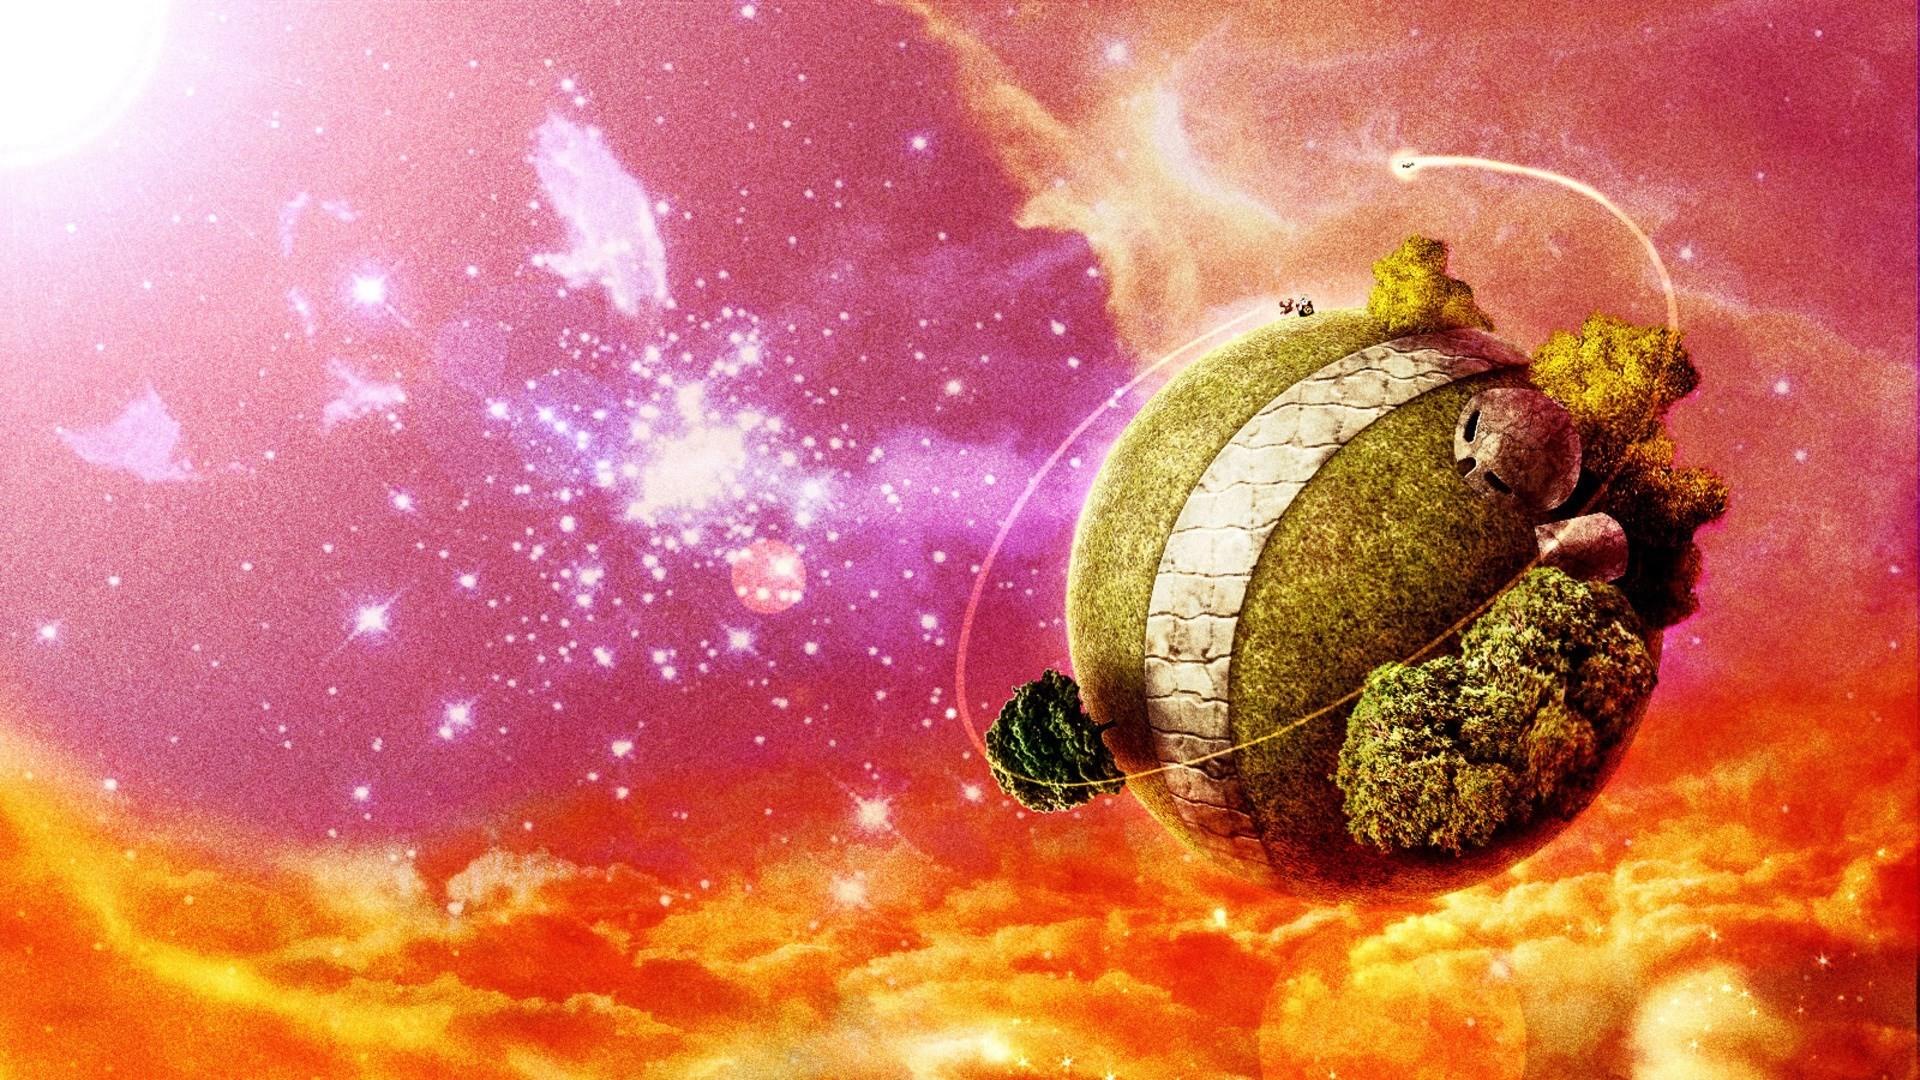 dragon ball z free wallpaper and screensavers